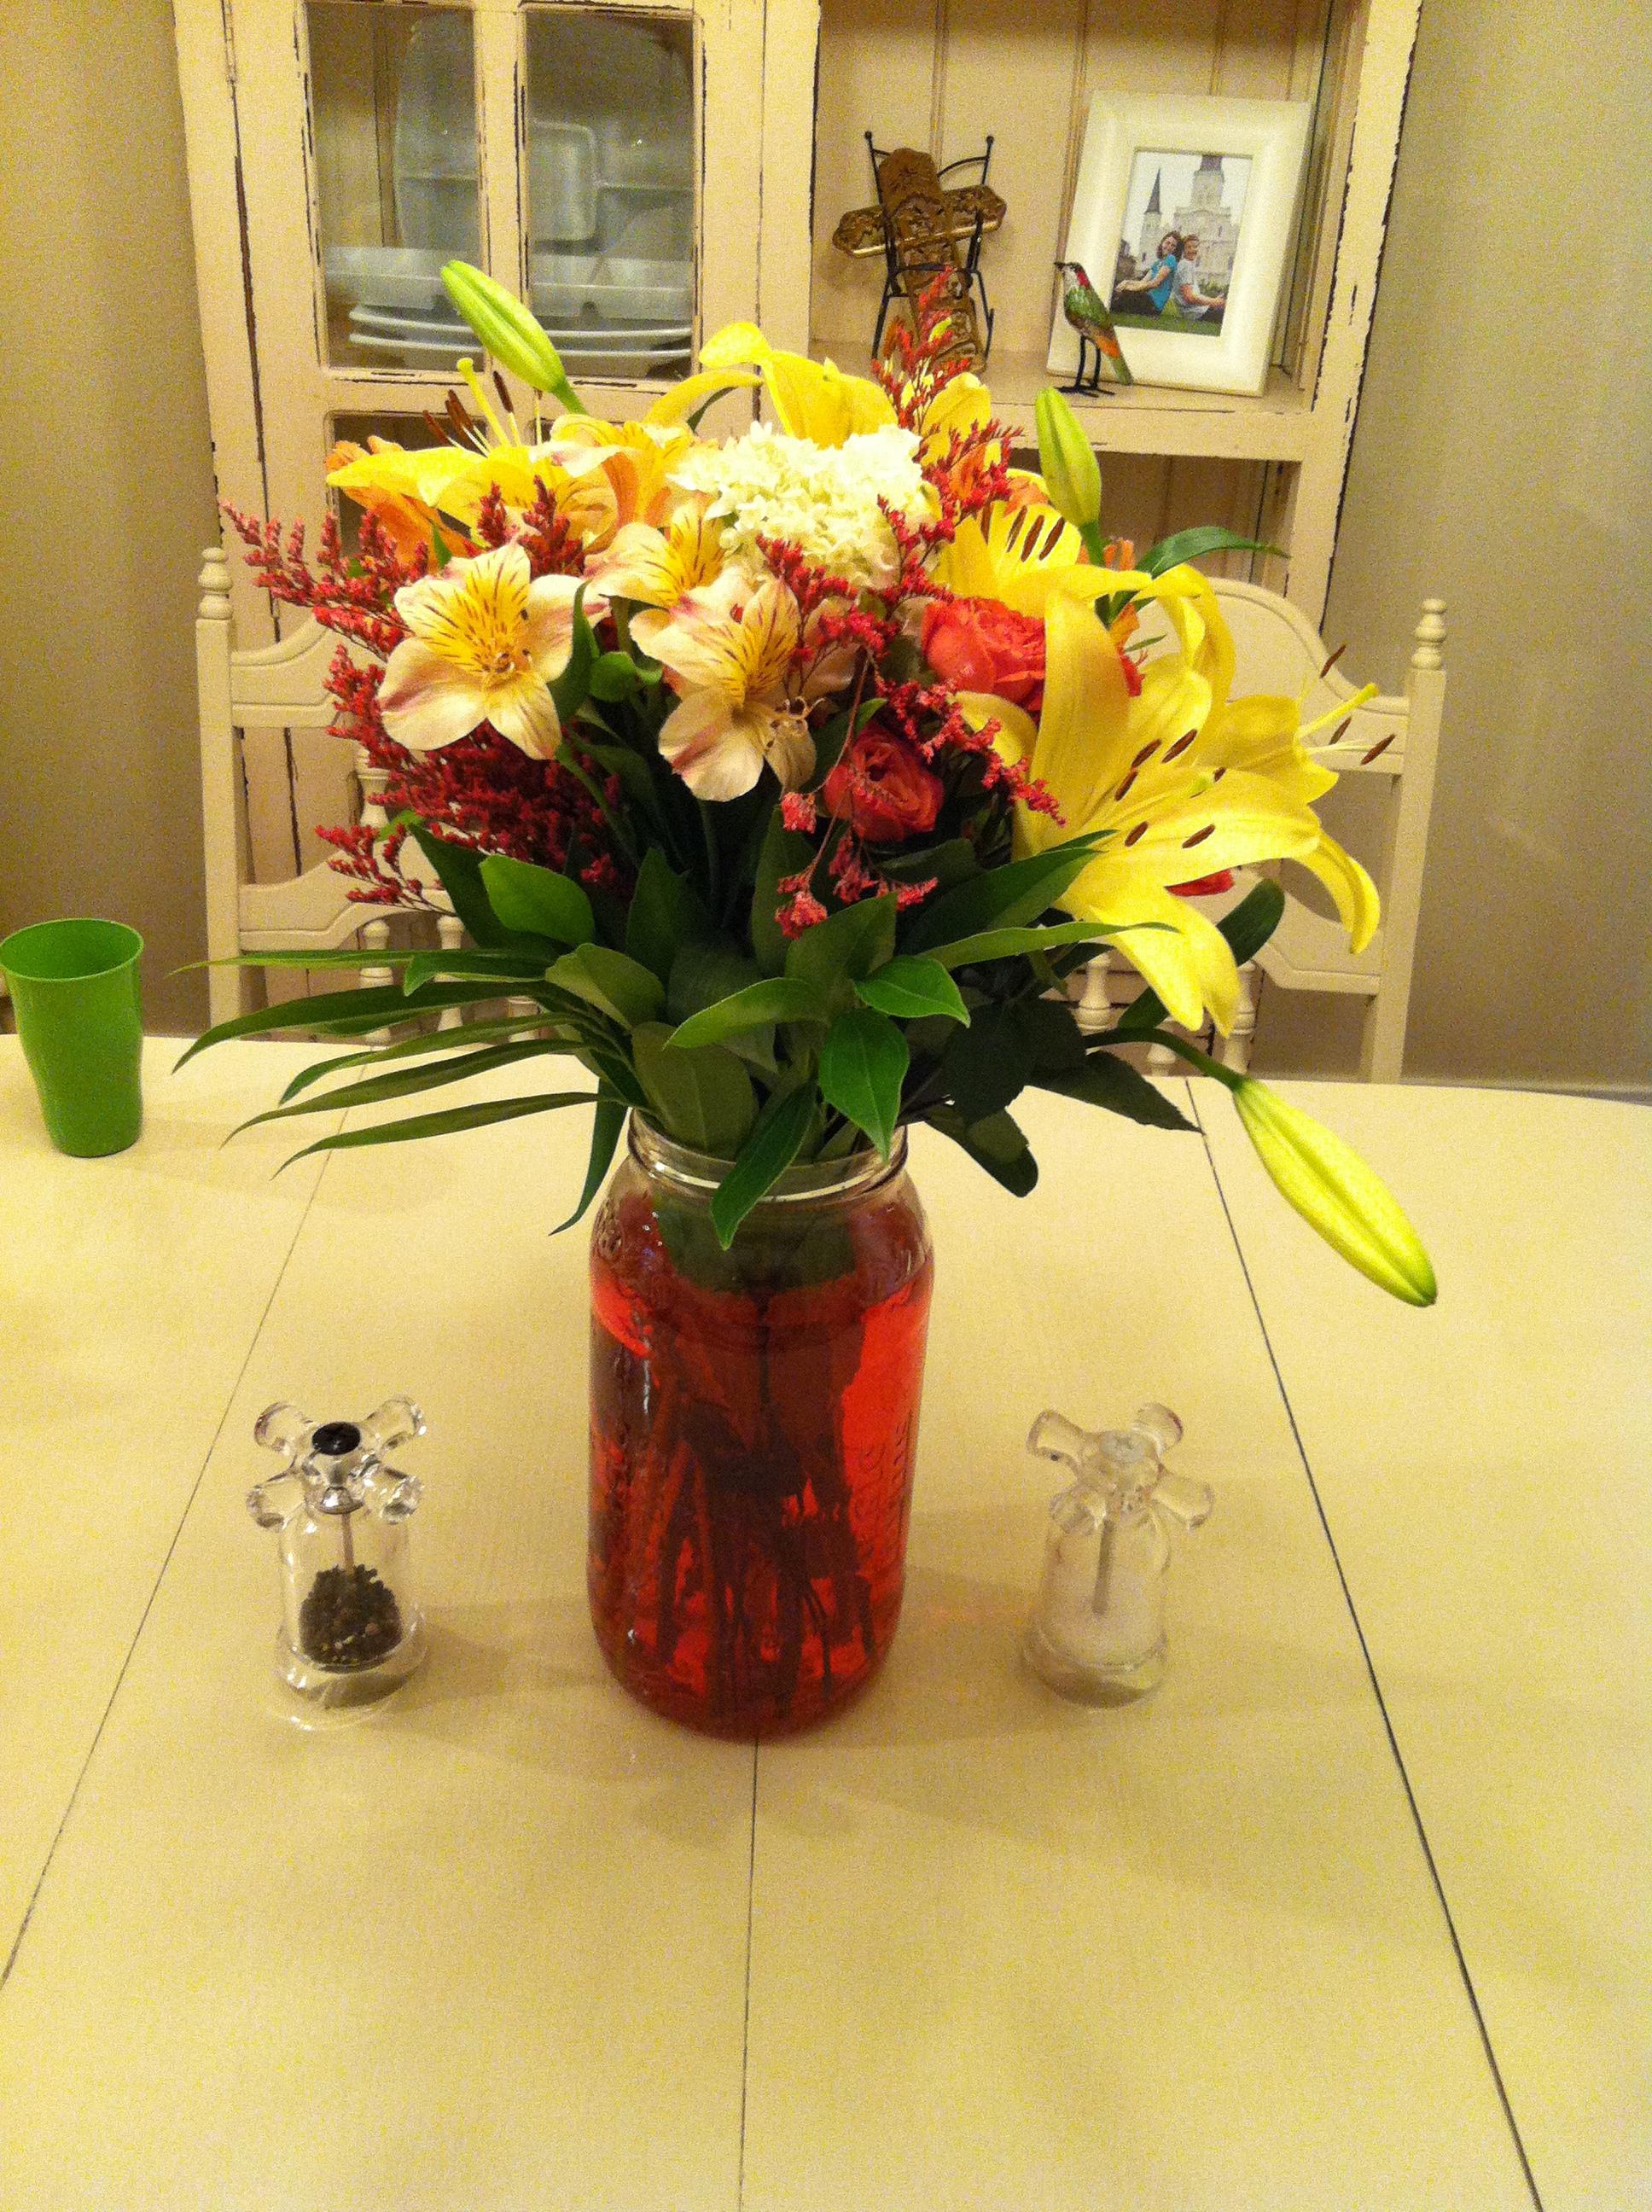 Vlasic pickle jar flower vase - excuse the green cup!